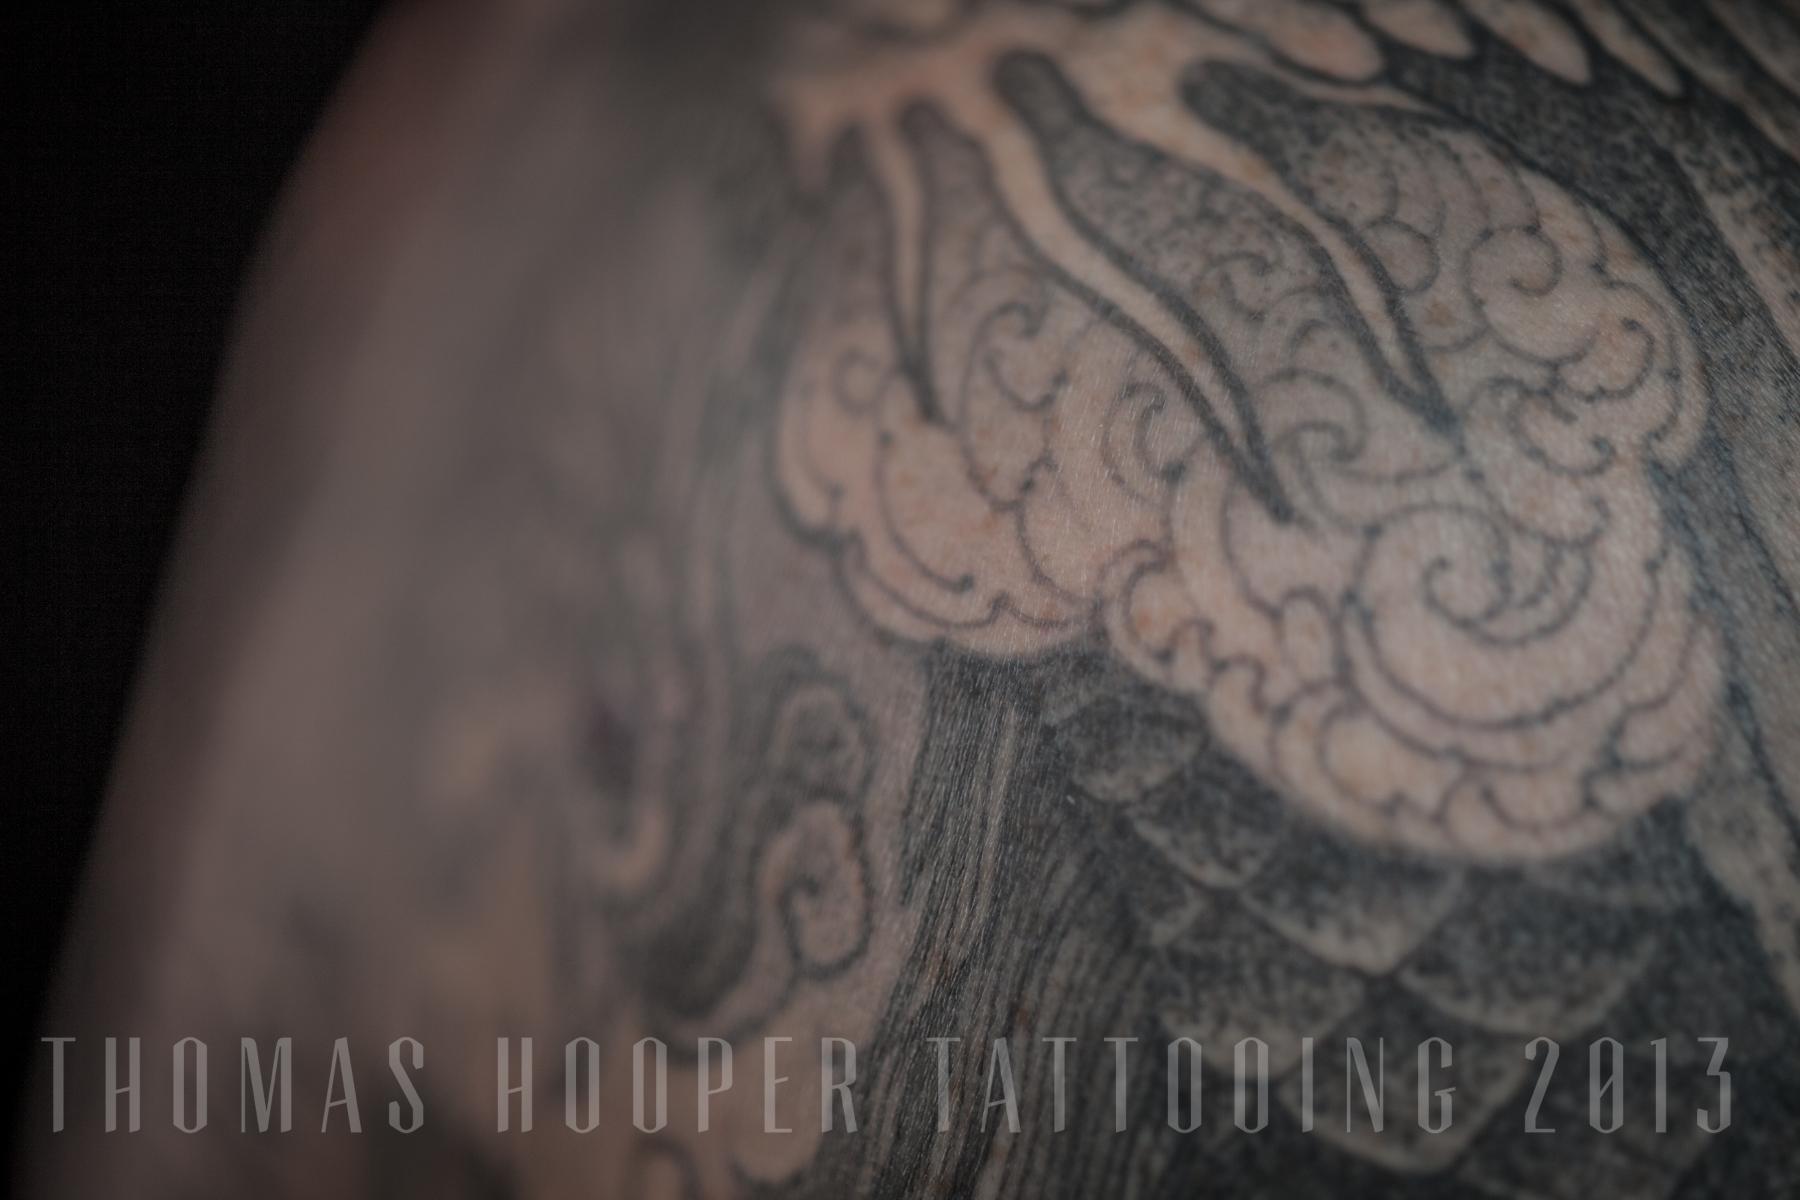 5b1b6a5c1 ... Hooper Tattooing Pheonix and Mandala Full Sleeve _10Thomas Hooper  Tattooing Pheonix and Mandala Full Sleeve _11Thomas Hooper Tattooing  Pheonix and ...